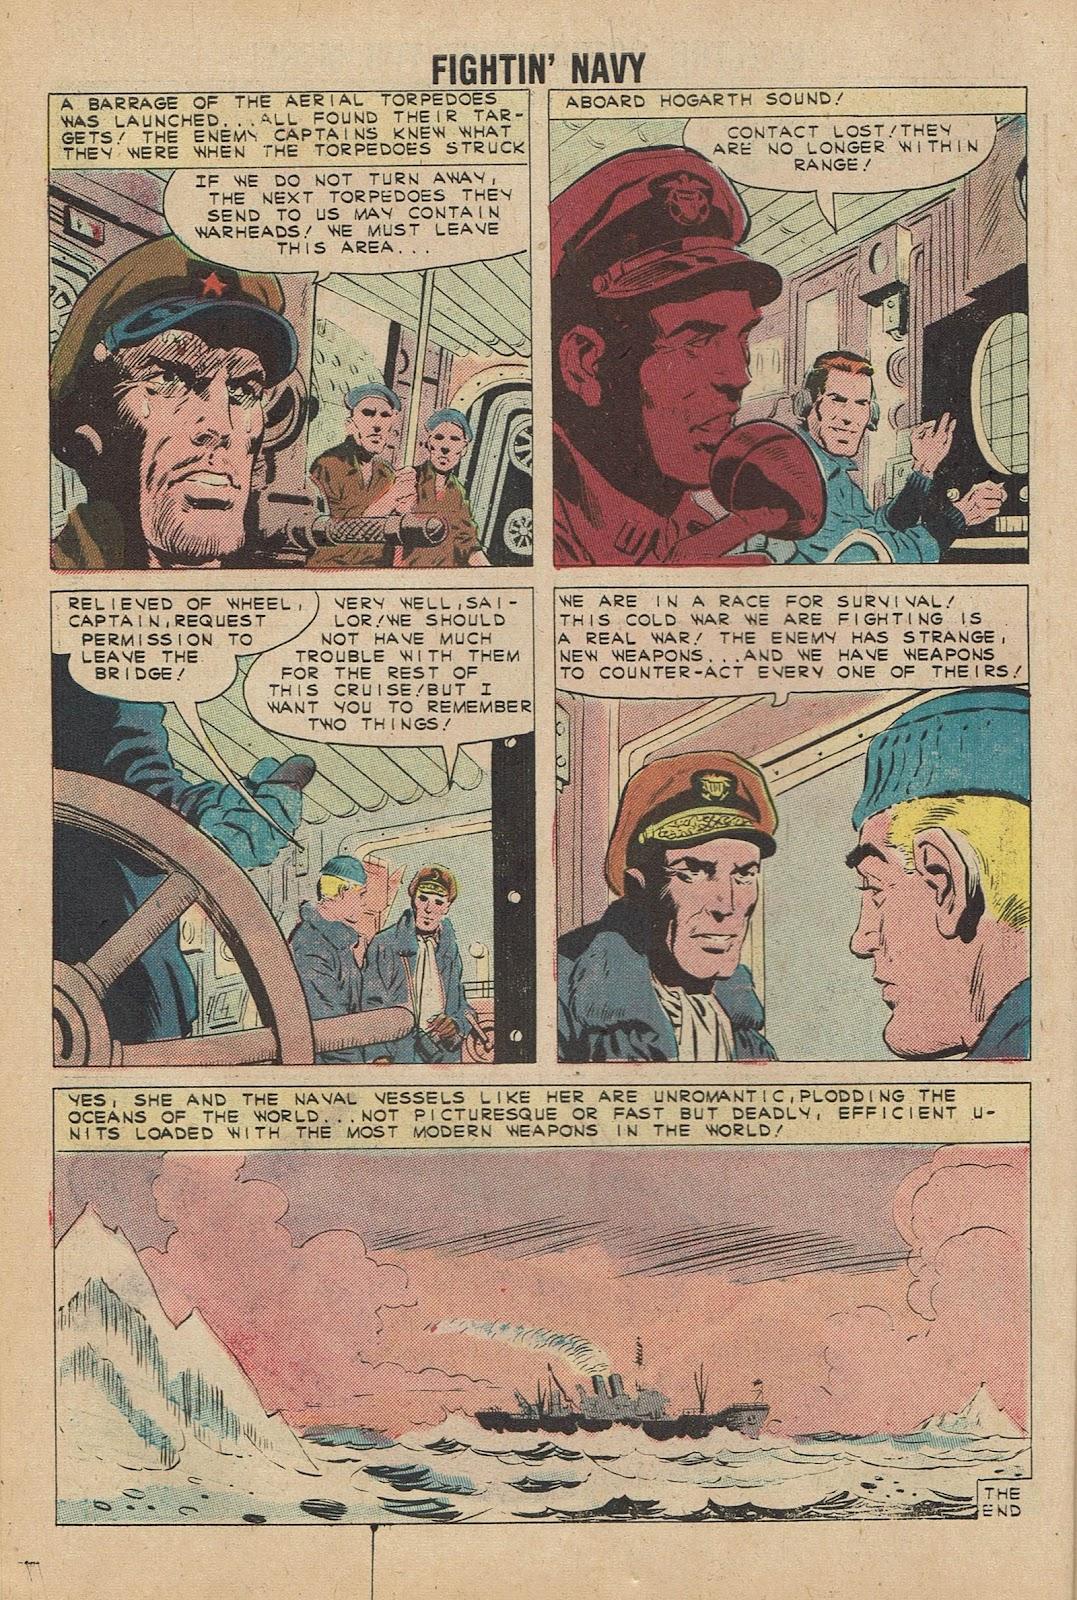 Read online Fightin' Navy comic -  Issue #98 - 10